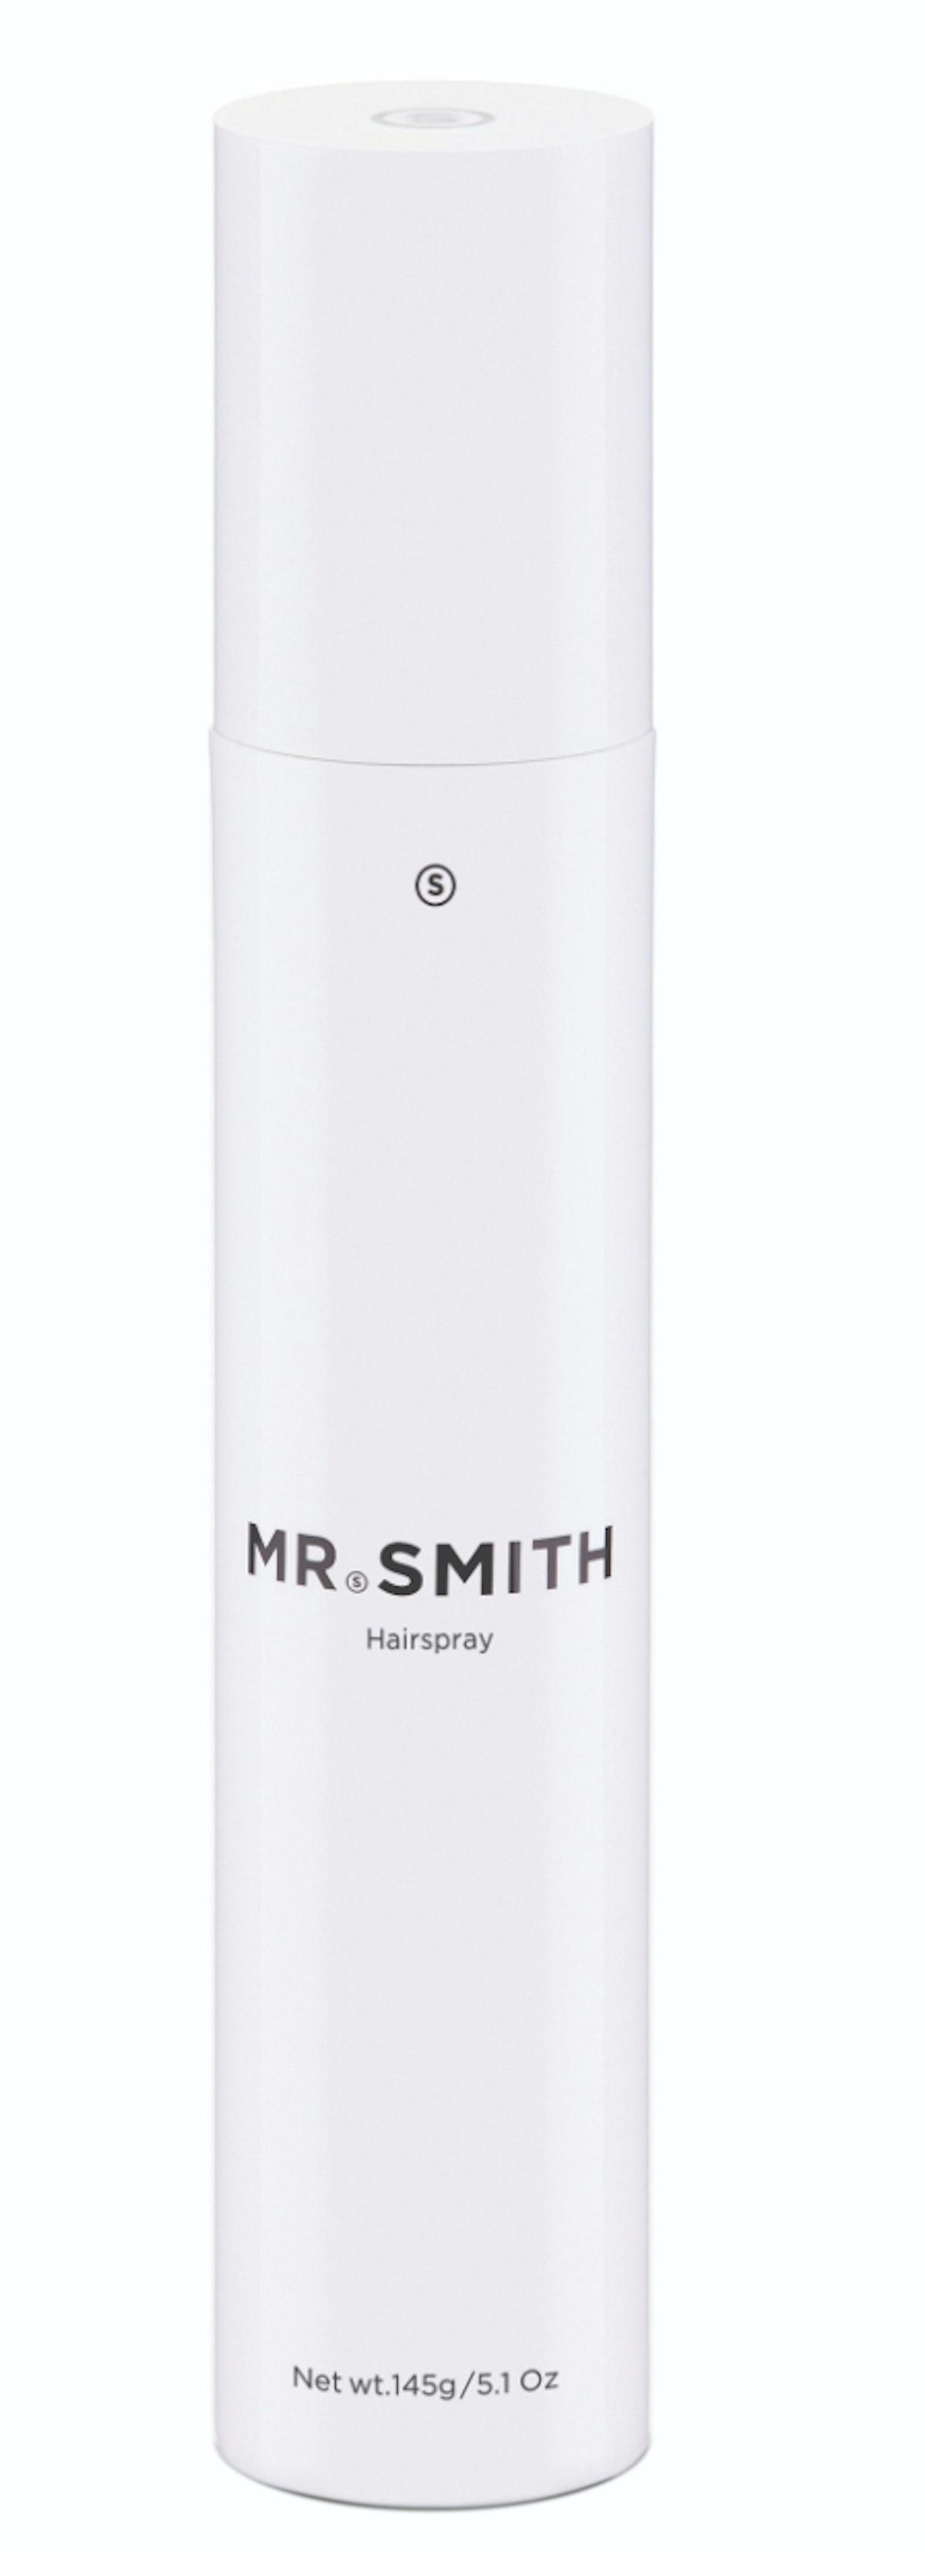 Mr. Smith Hairspray